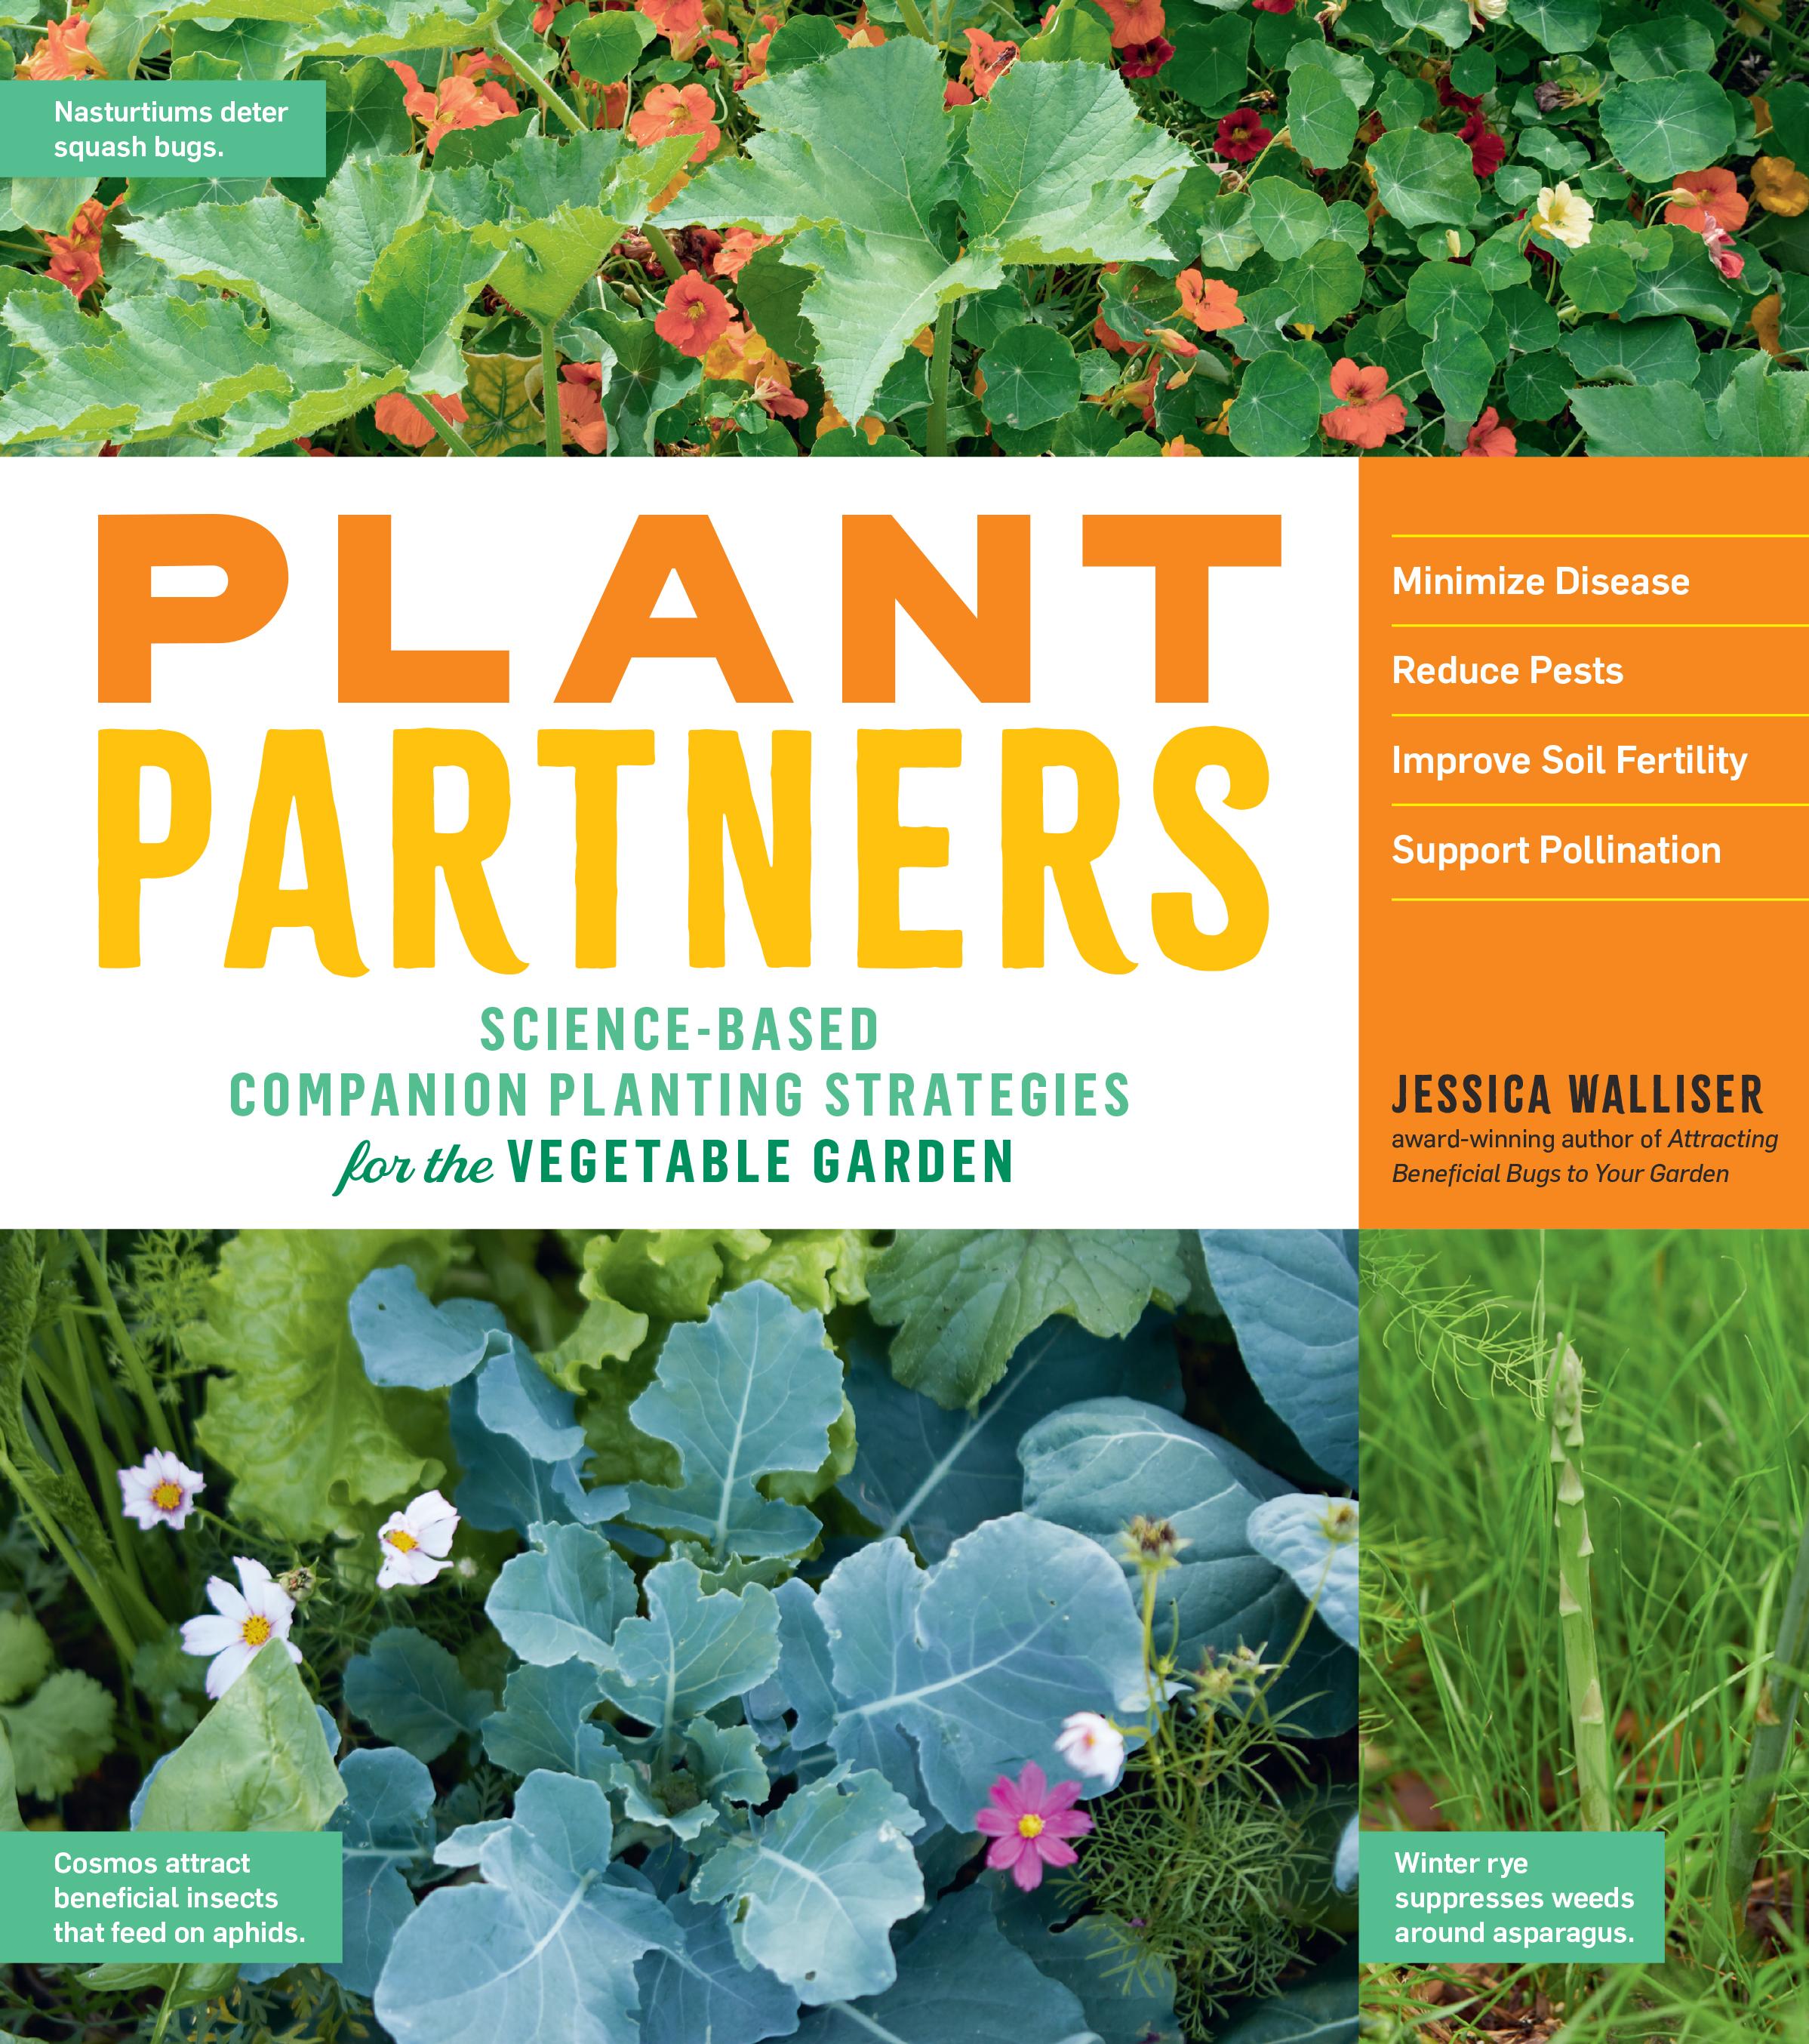 Plant Partners Science-Based Companion Planting Strategies for the Vegetable Garden - Jessica Walliser